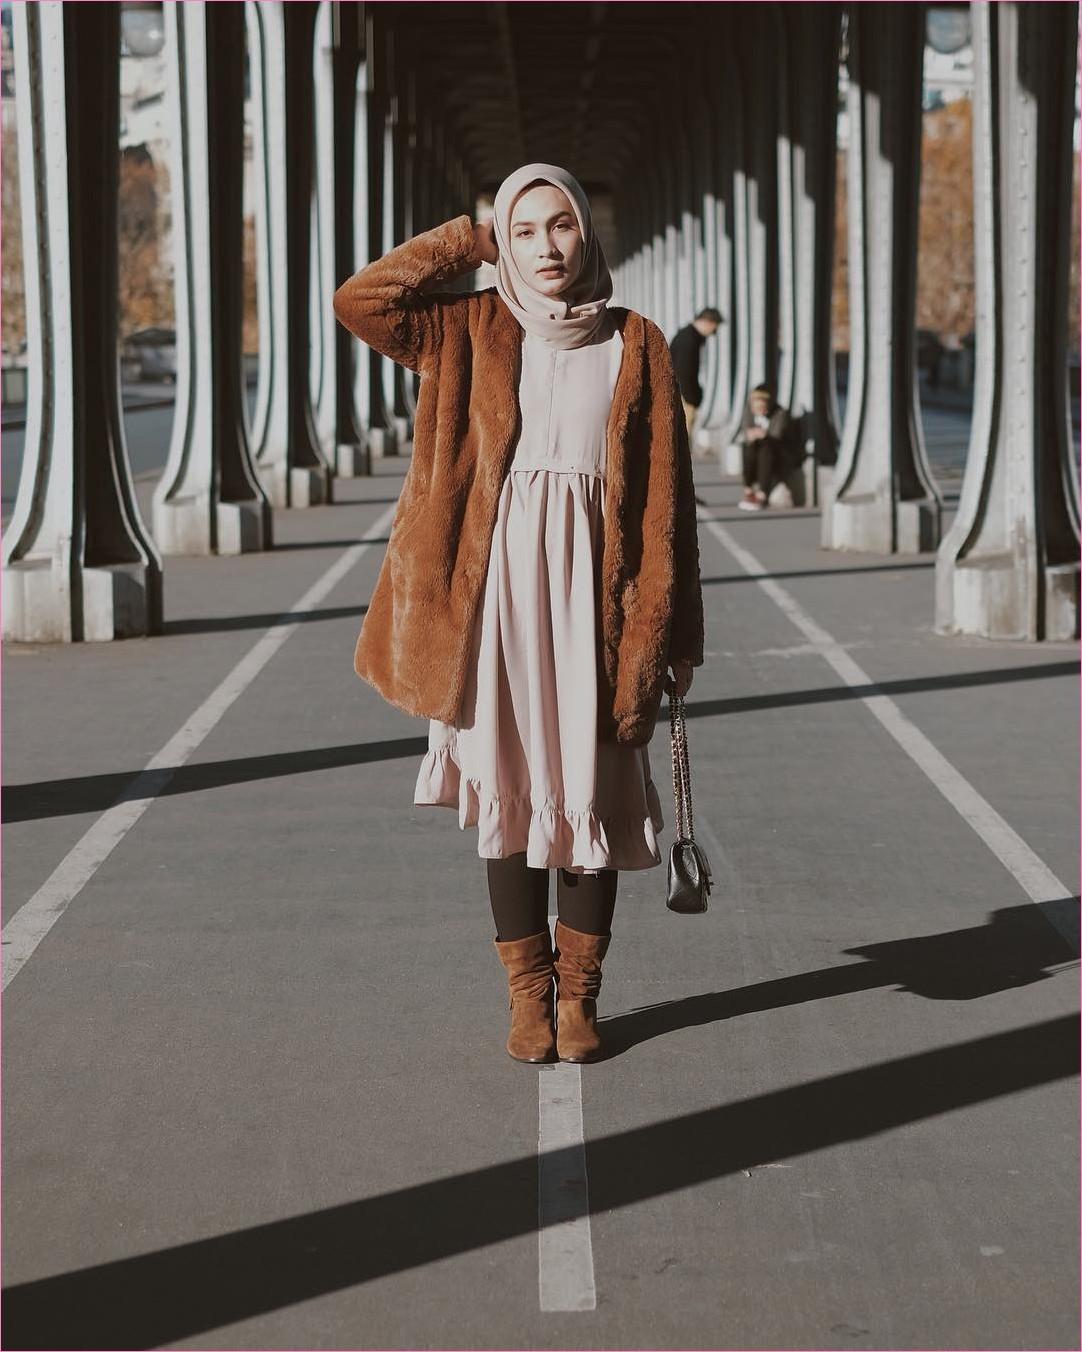 Outfit Baju Traveler Berhijab untuk Keluar Negri Ala Selebgram 2018 boots jacket bulu oren tua dress abaya tunic baby pink legging coklat slingbags channel ootd outfit london trendy ciput rajut kerudung segiempat coat